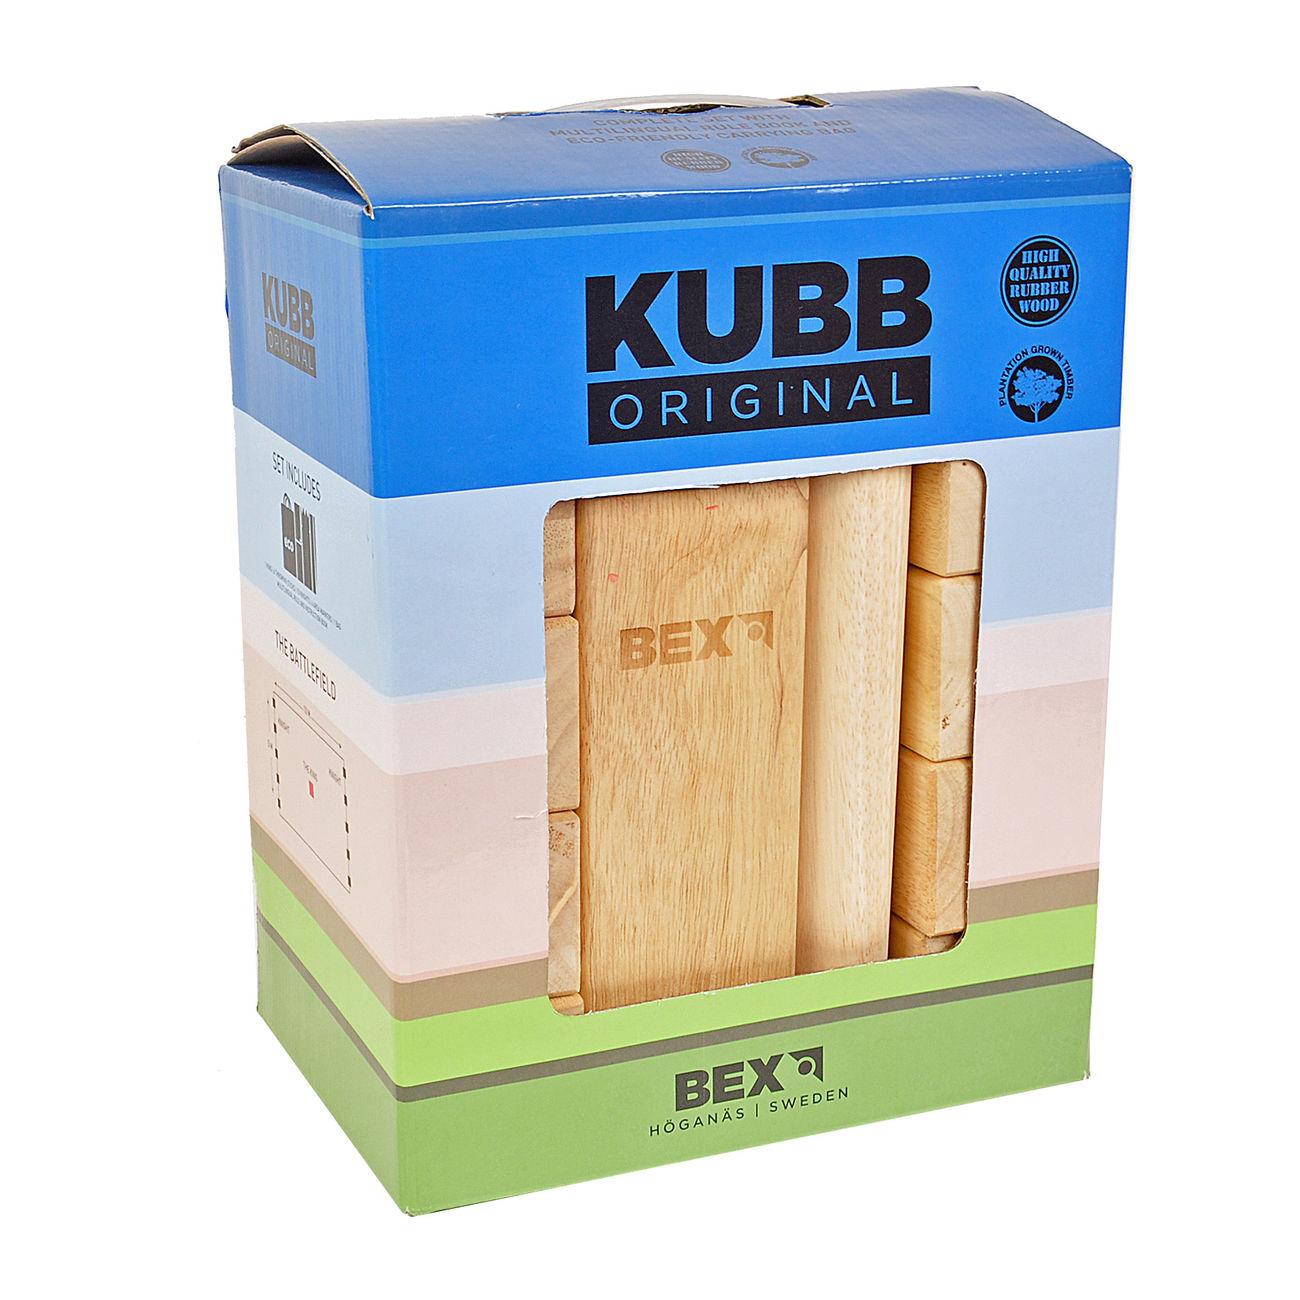 bex original kubb outdoorspiel g nstig kaufen kotte zeller. Black Bedroom Furniture Sets. Home Design Ideas